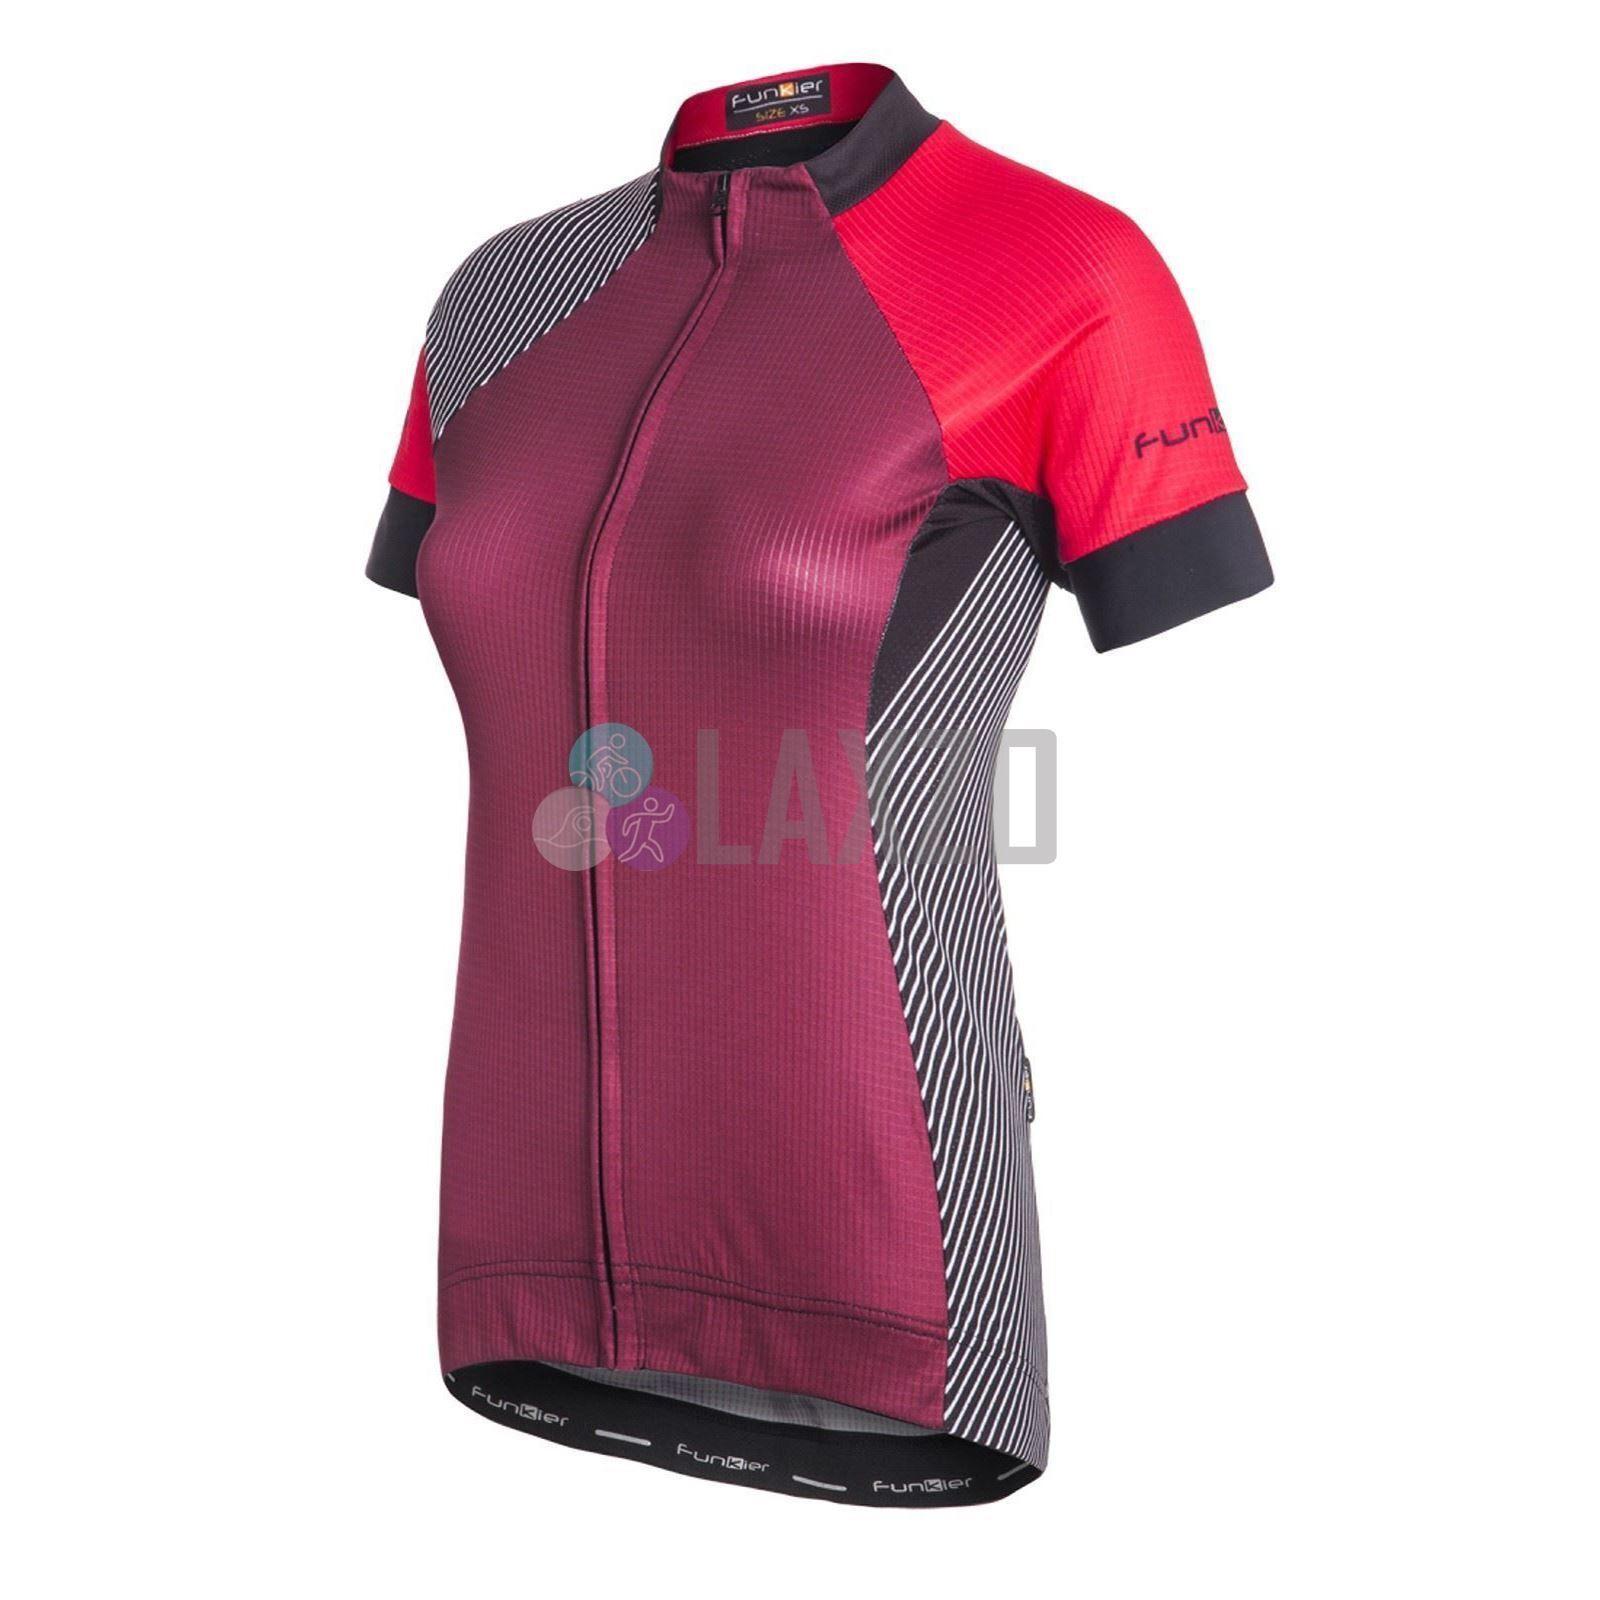 Funkier Mataro Pro Ladies Rider Short  Sleeve Jersey Racer Cut in Merlot Large  preferential